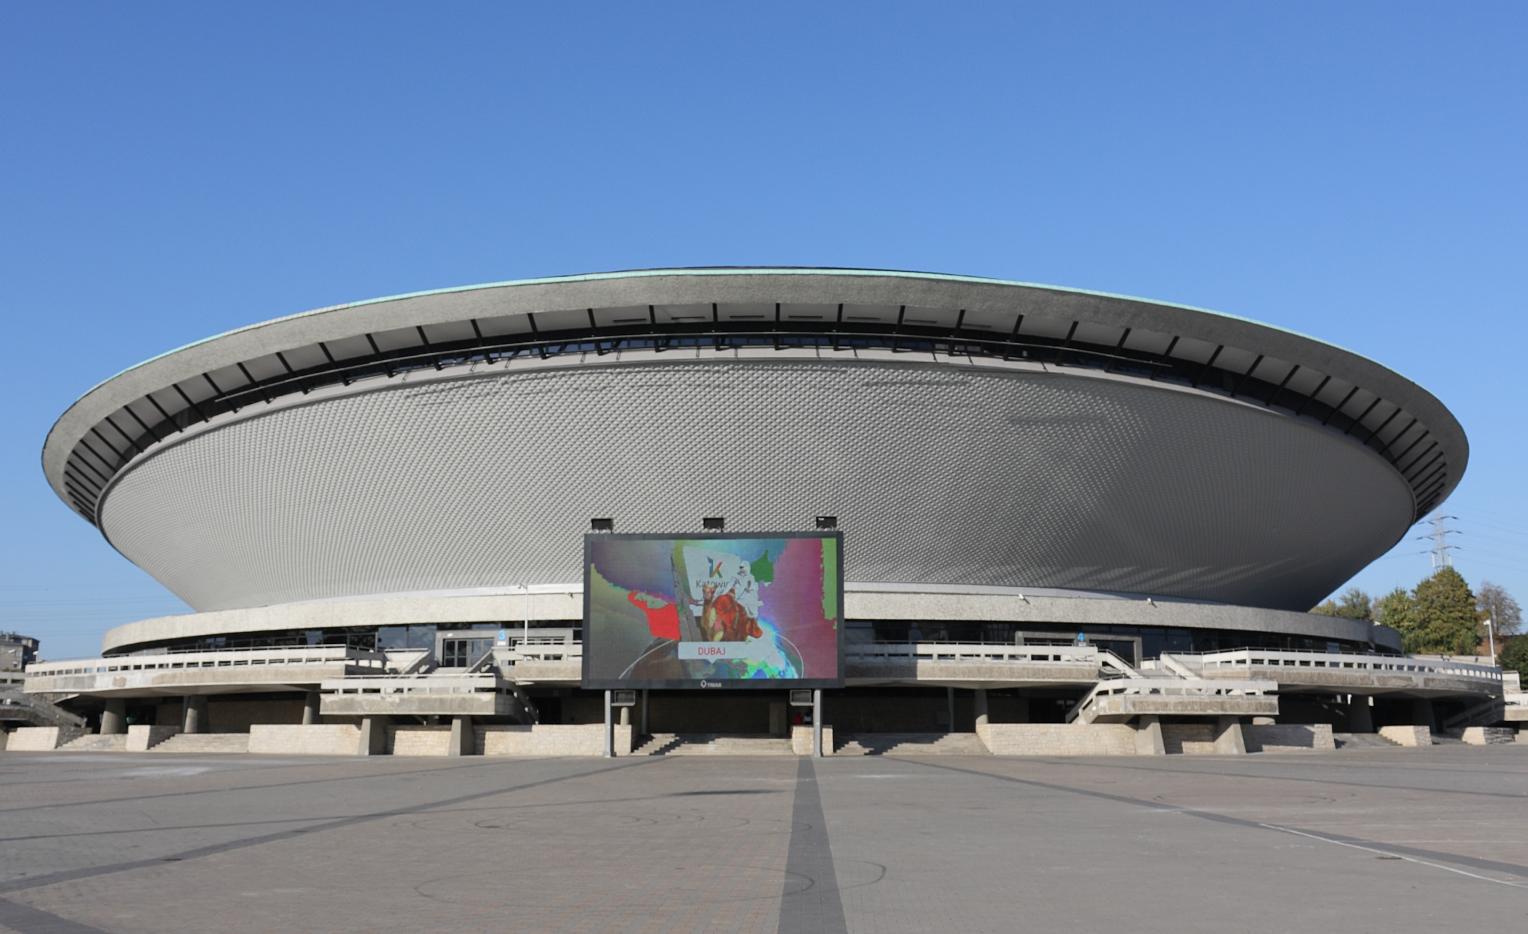 http://upload.wikimedia.org/wikipedia/commons/e/e0/Katowice_Spodek-_Nowa_elewacja.jpg